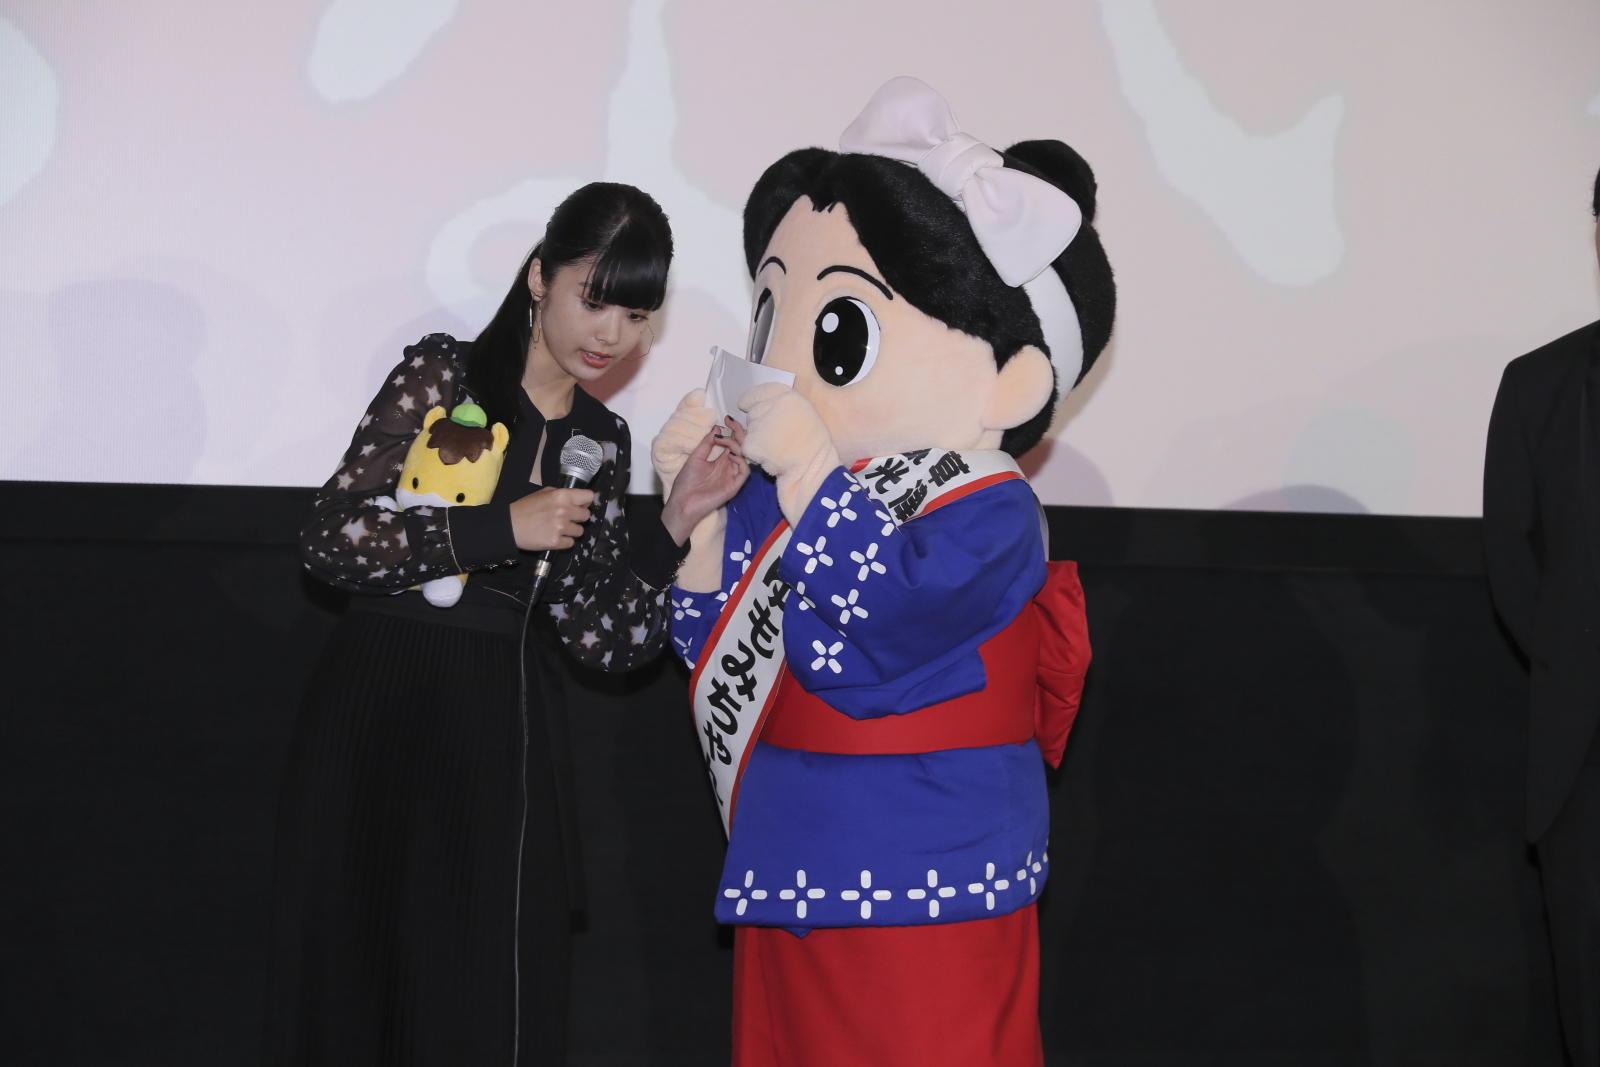 http://news.yoshimoto.co.jp/20170716174045-d167148ad48be61439aa19eddaed284c51ce2e1d.jpg